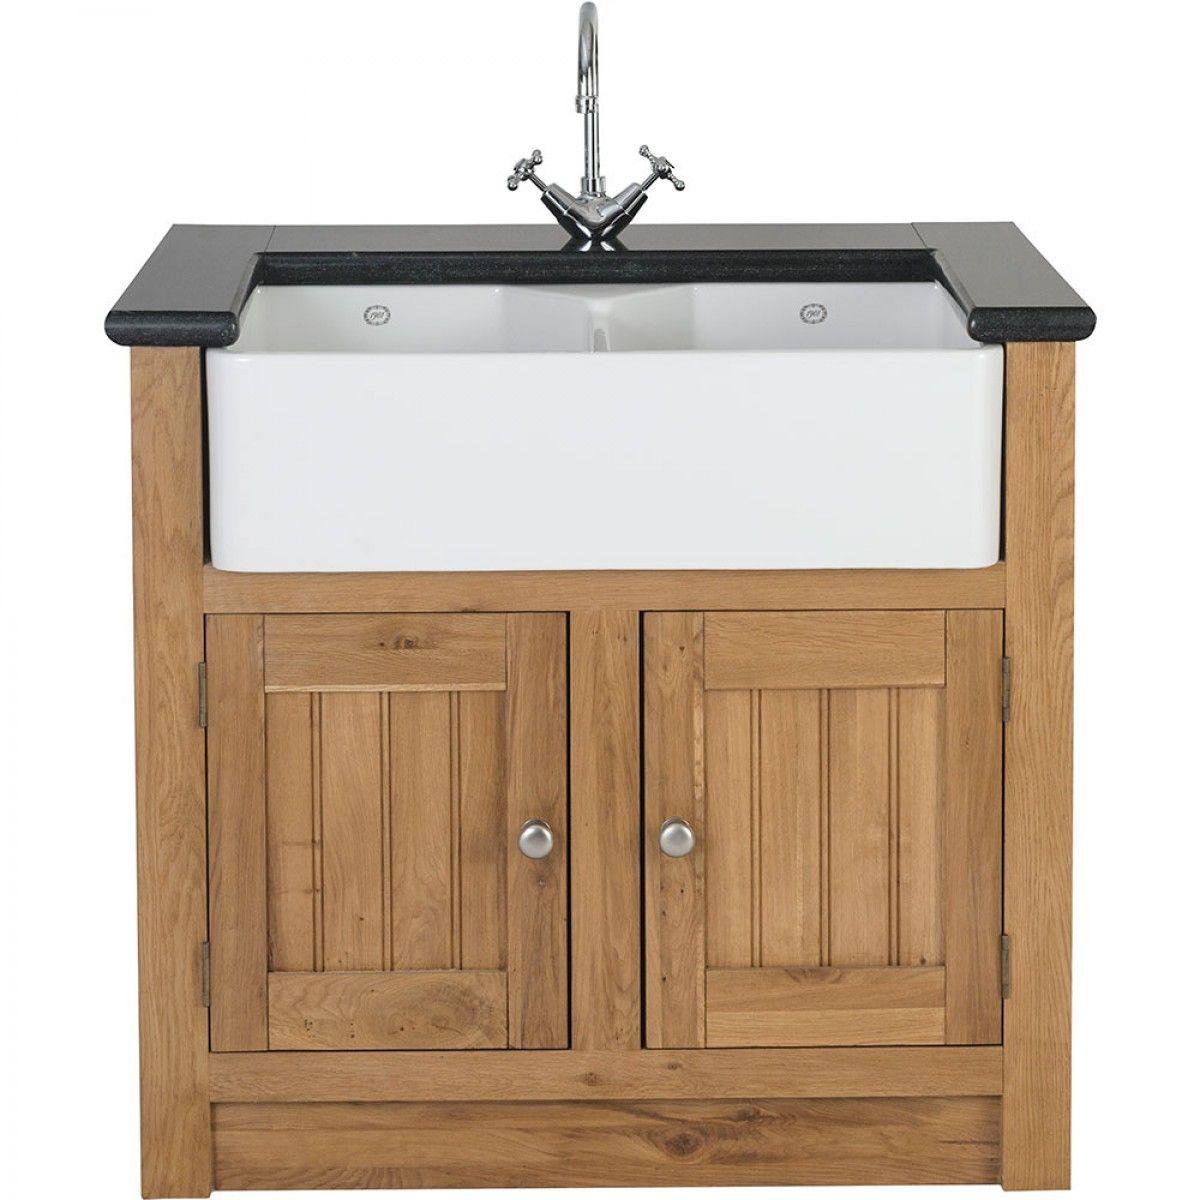 orchard oak 2 door sink cabinet 980x665x900mm belfast sink rh pinterest com